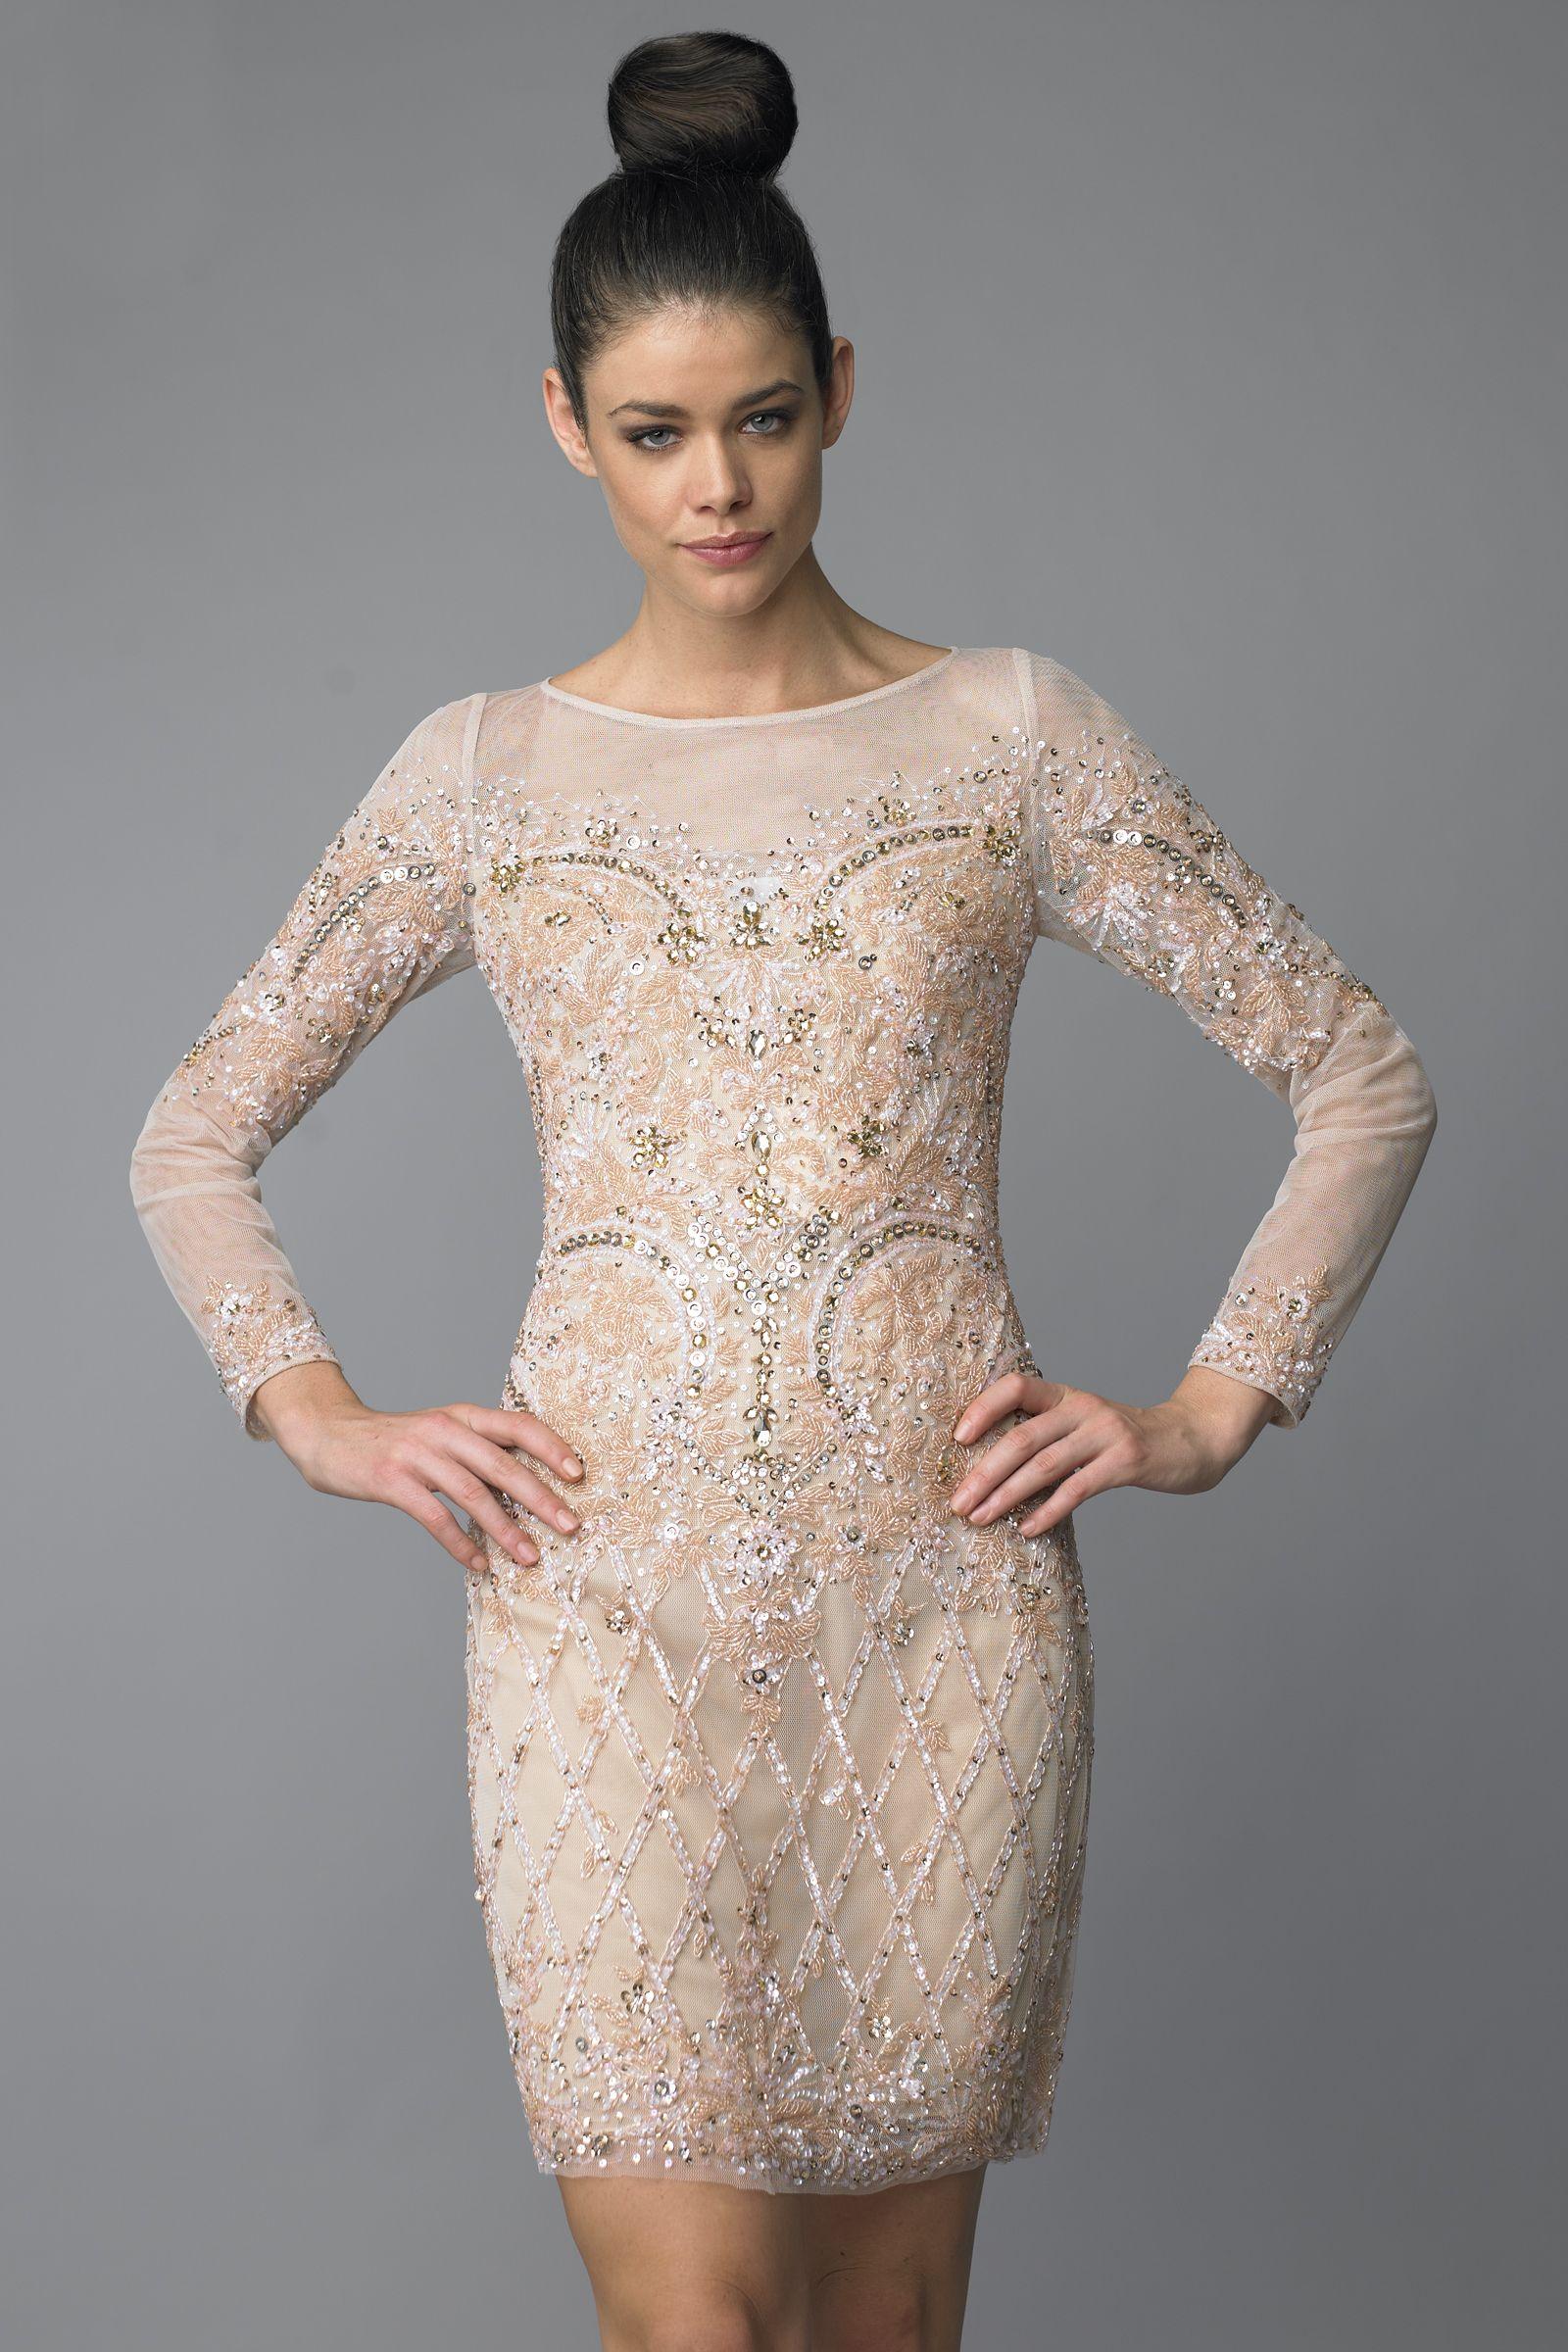 Cocktail-Dresses-Long-Sleeve-1-2   Cocktail Dresses Inspiration ...